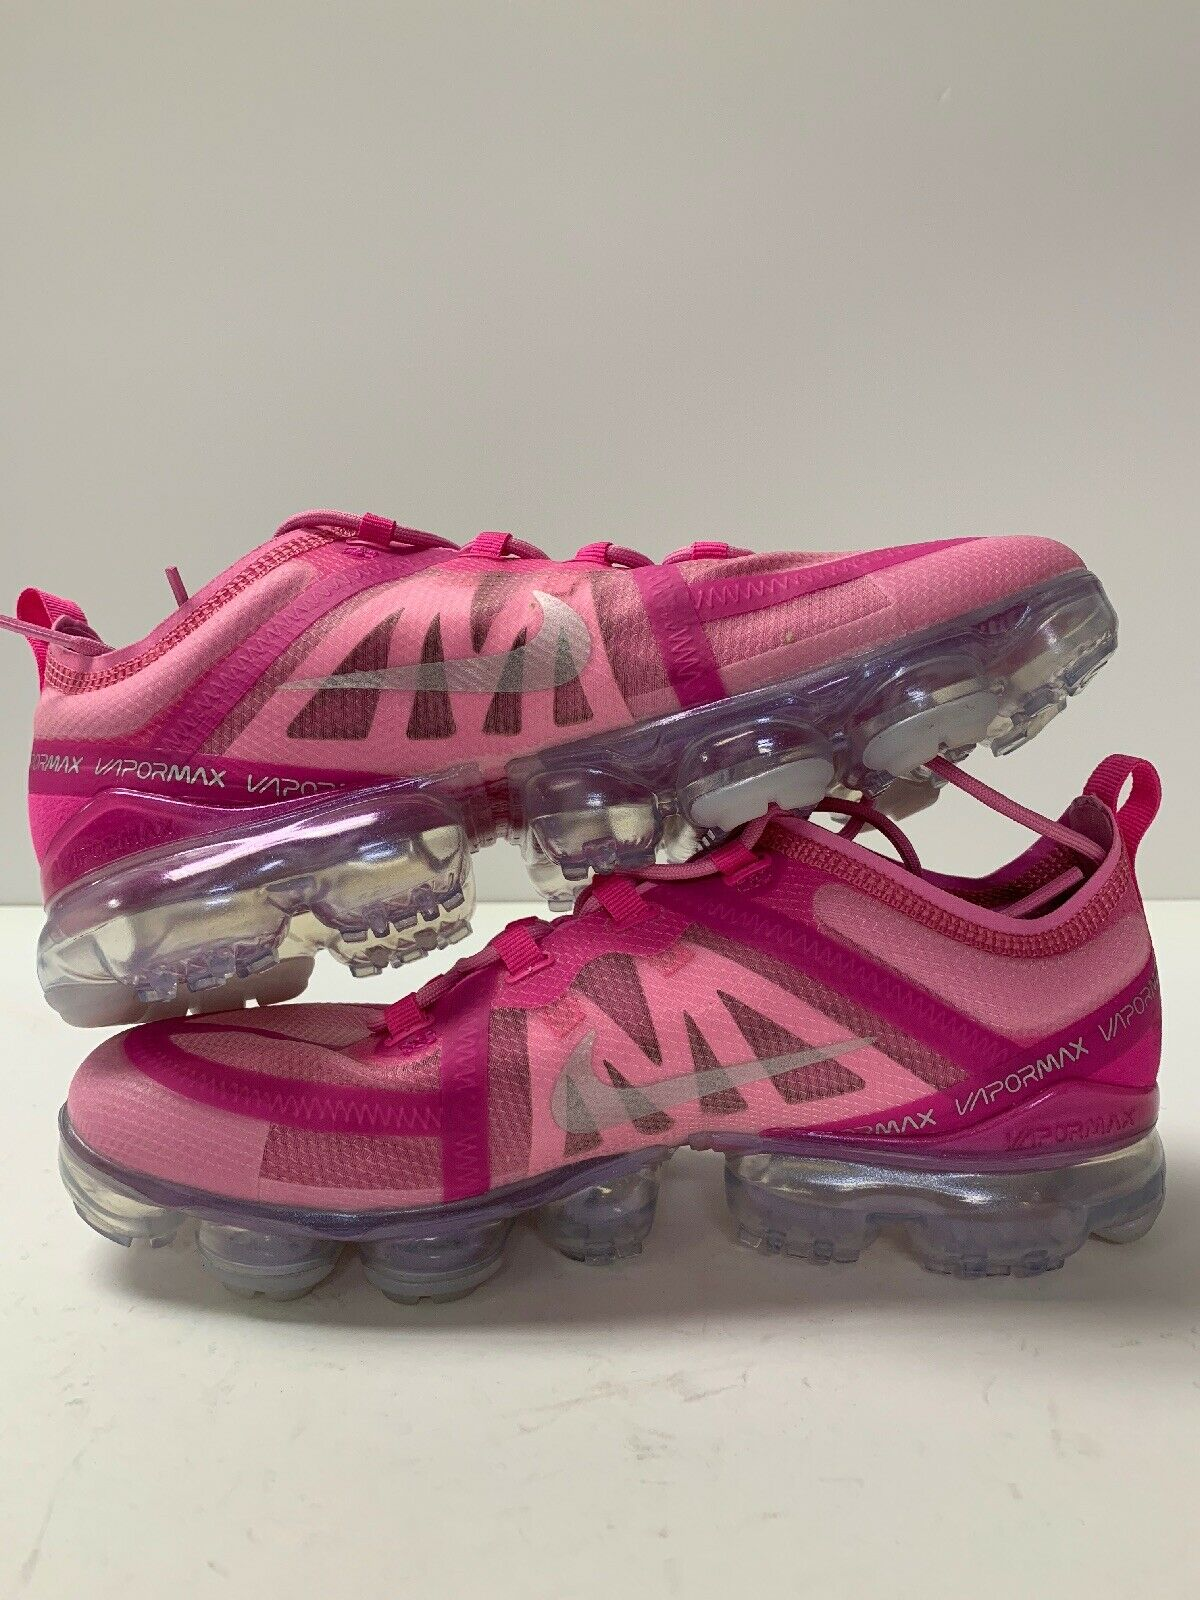 Womens 2019 Nike Vapormax AR6632-600 Active Fuchsia Pink & Metallic Silver Sz 10